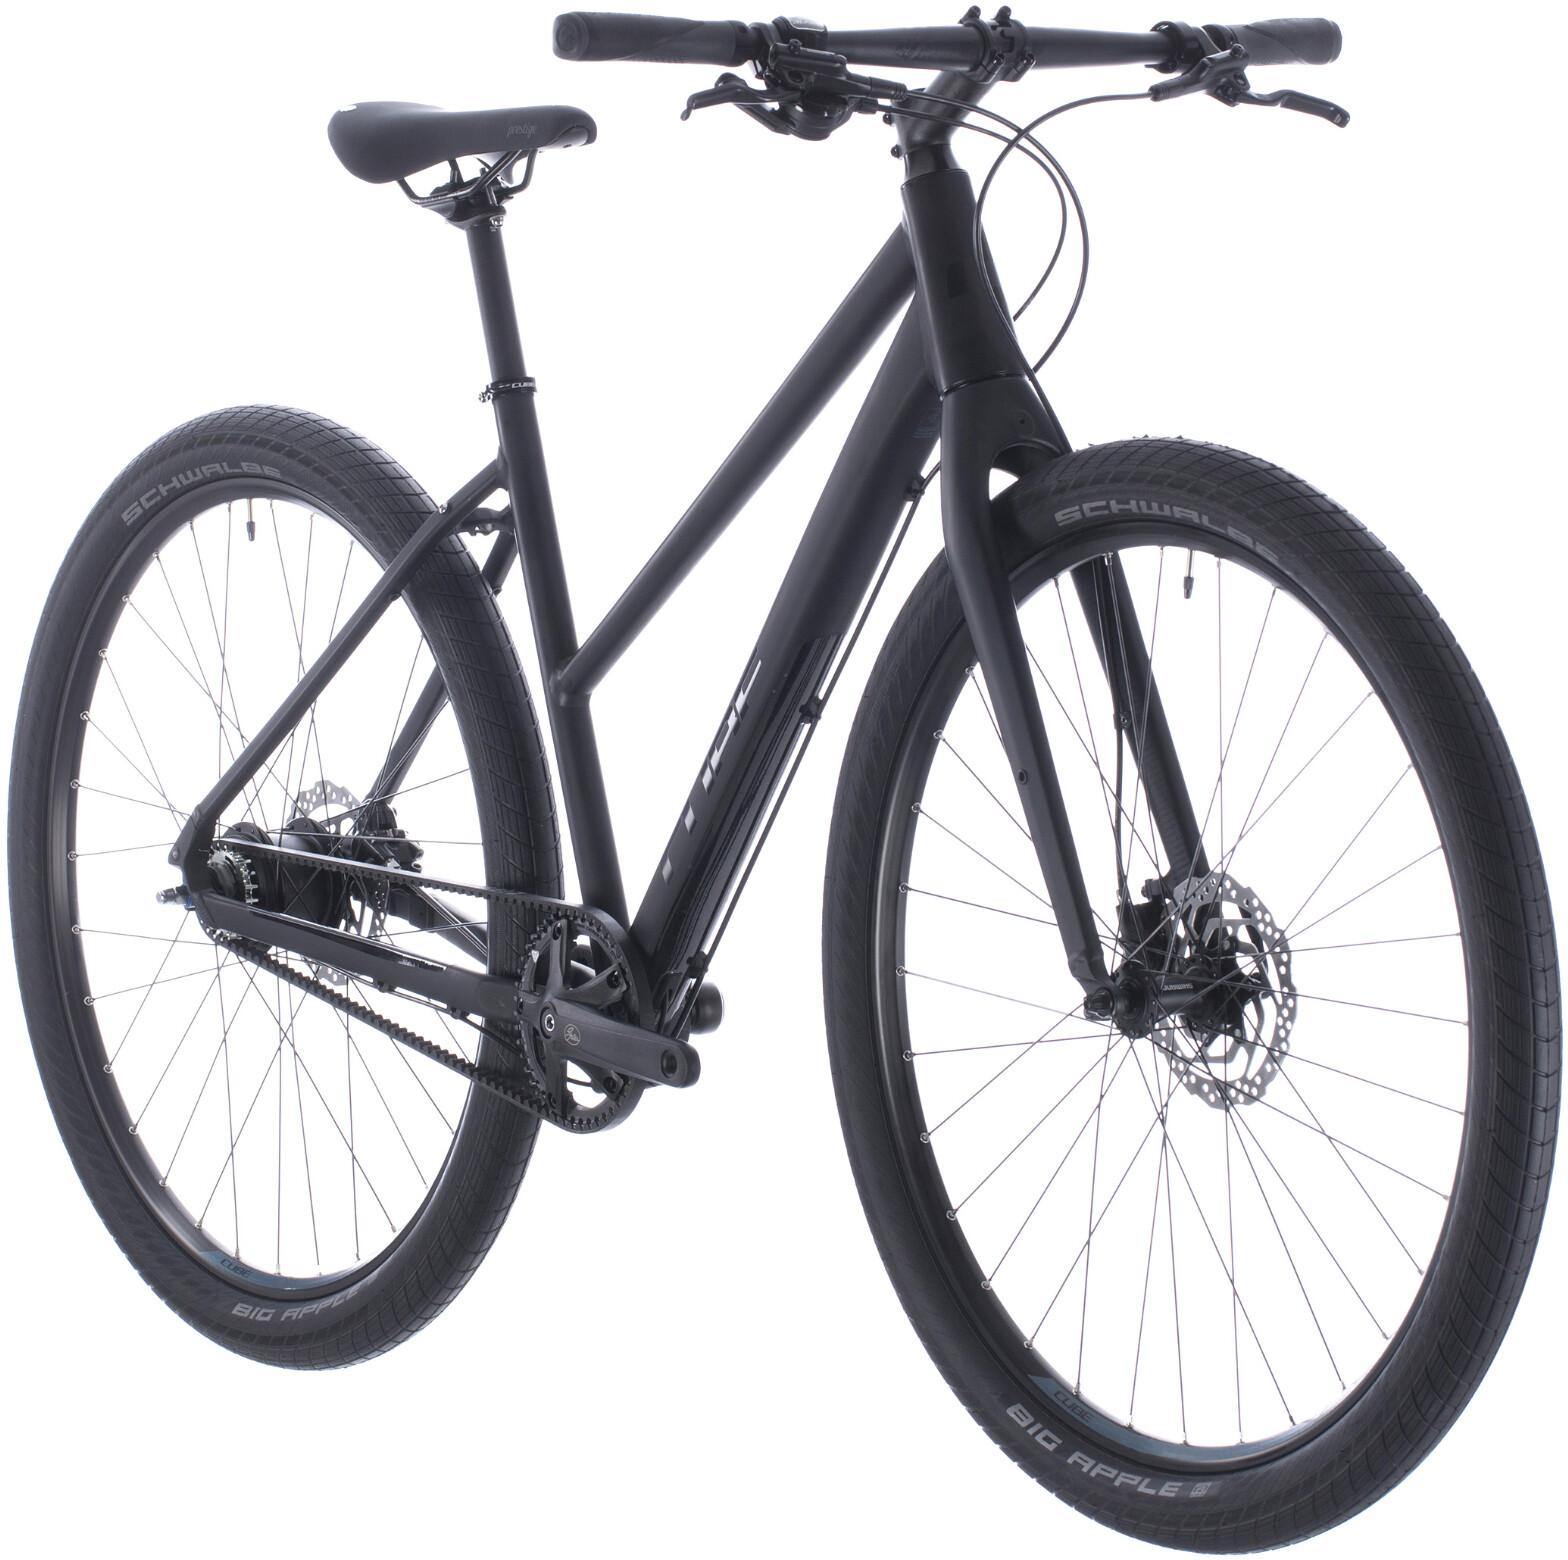 bikester.ch990380.html 2020 02 09 daily 0.1